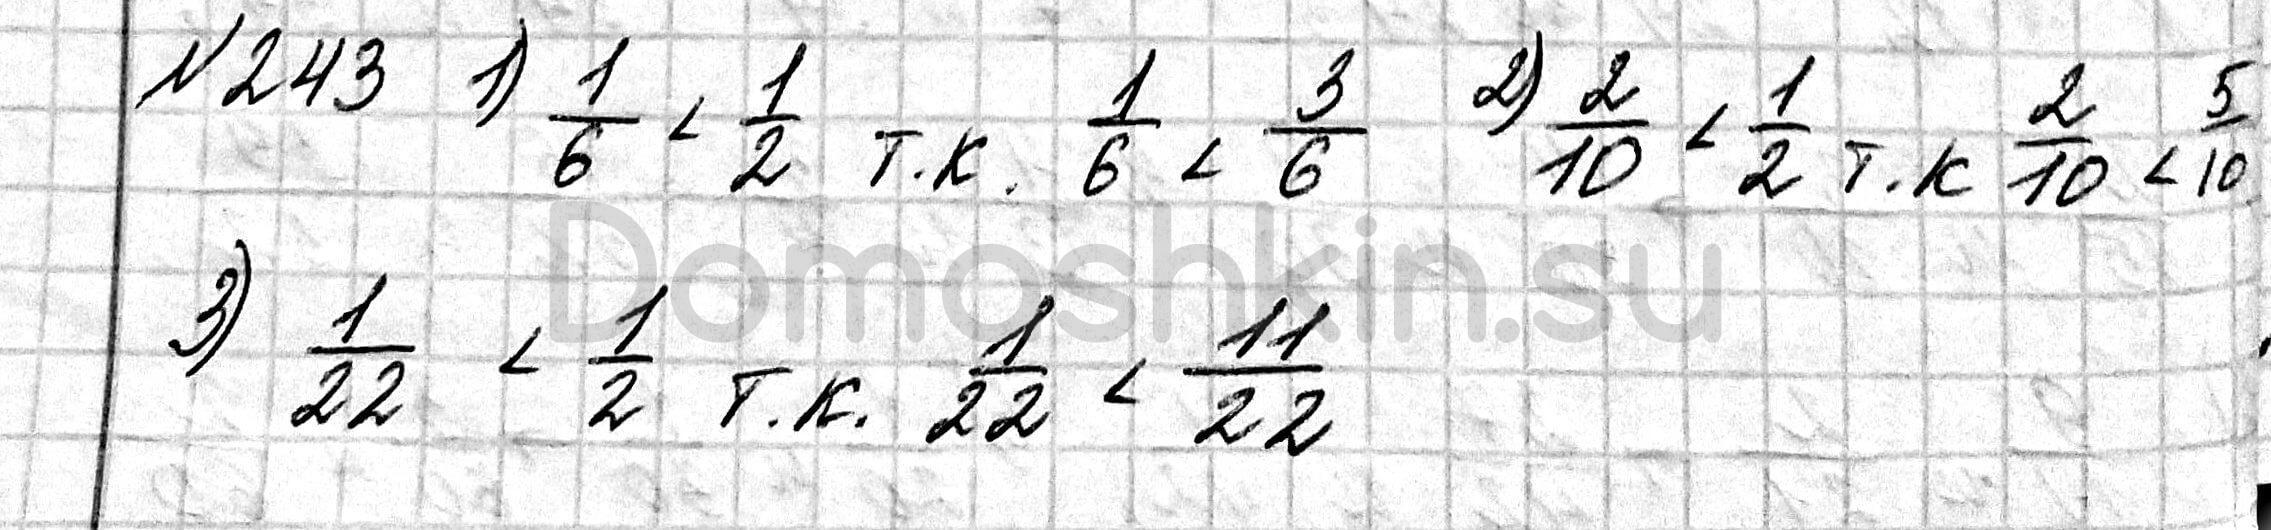 Математика 6 класс учебник Мерзляк номер 243 решение